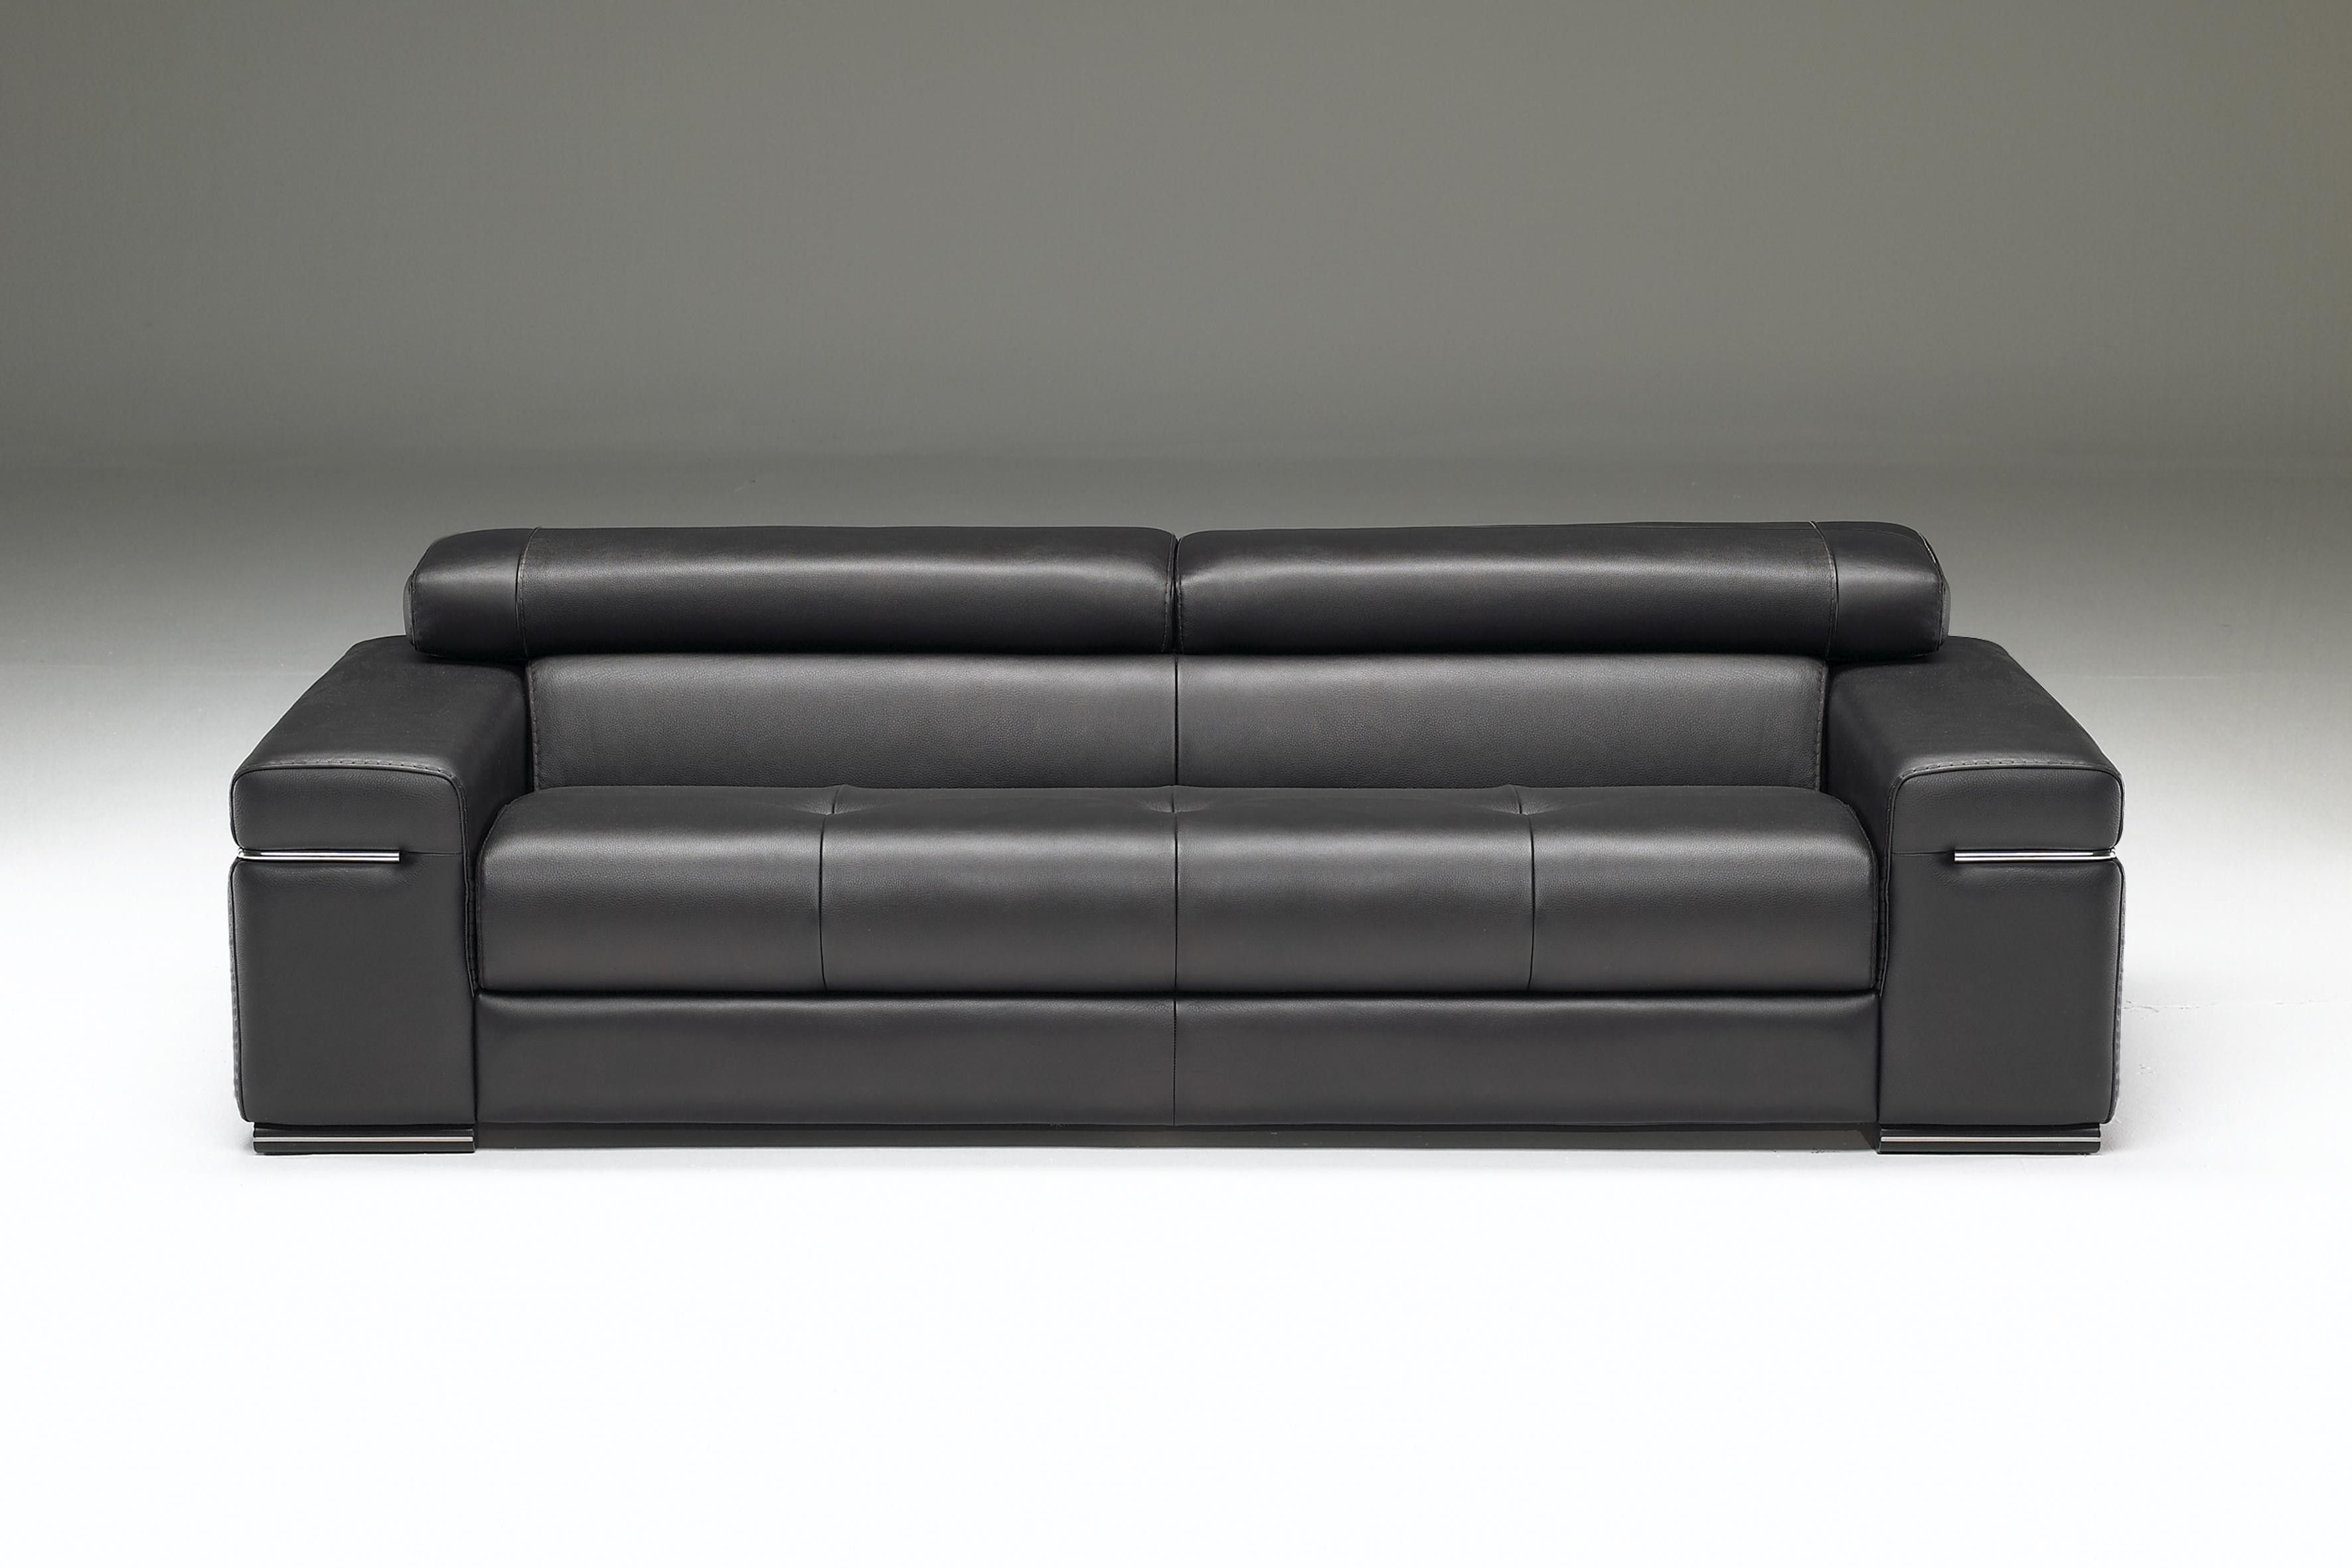 Natuzzi Italia Sofa Avana 2570 Natuzzi Italian Furniture Modern